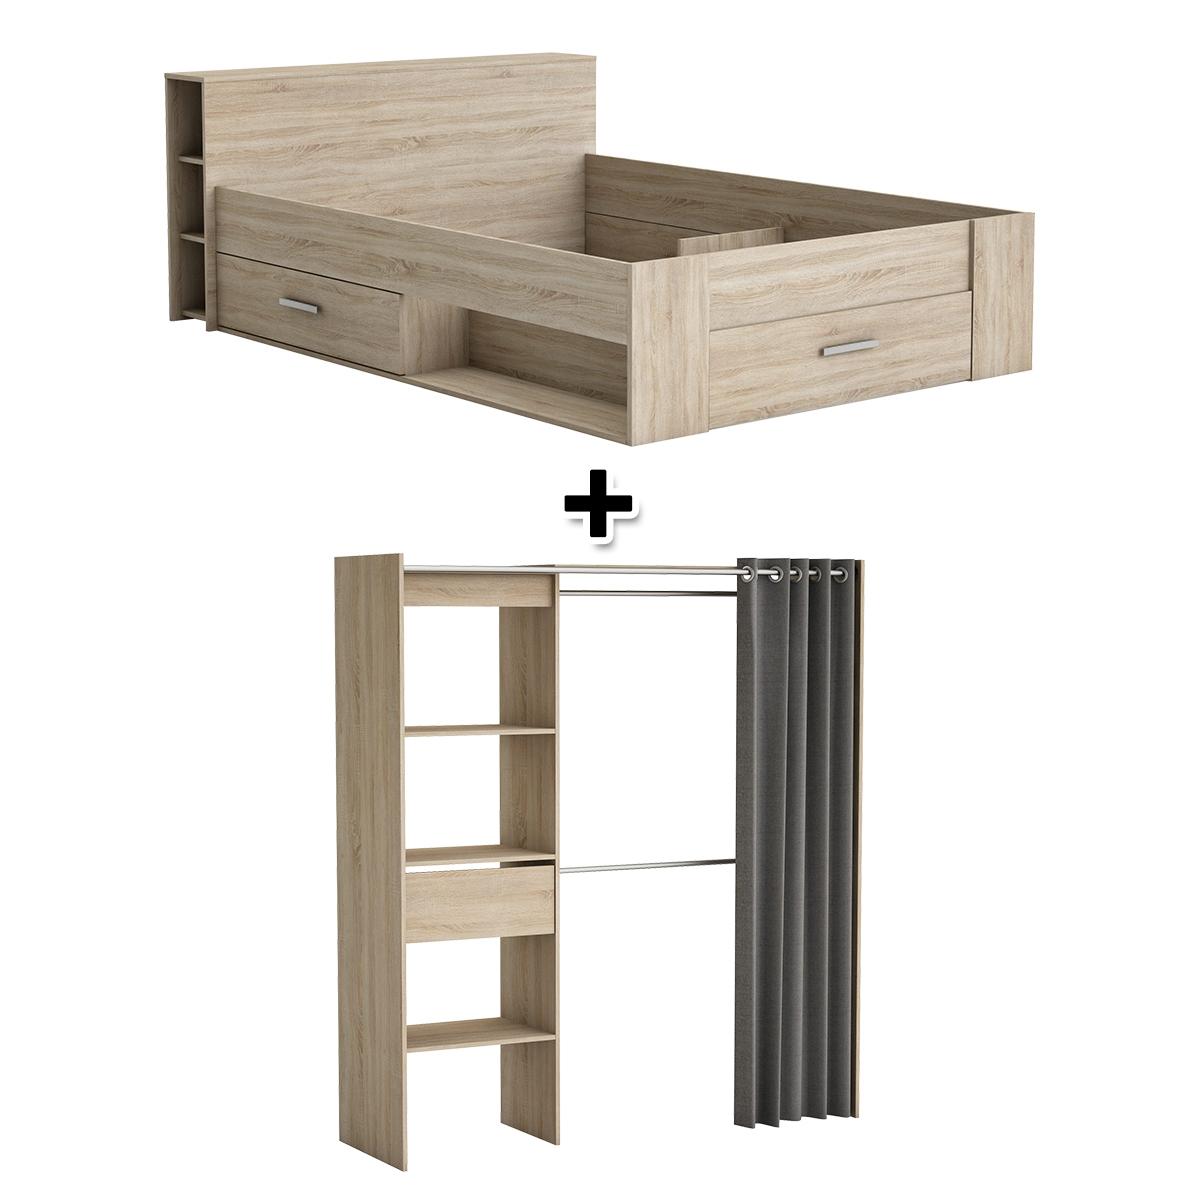 - Lit 140X190 cm SMART ch�ne + armoire dressing MOKA ch�ne bross�